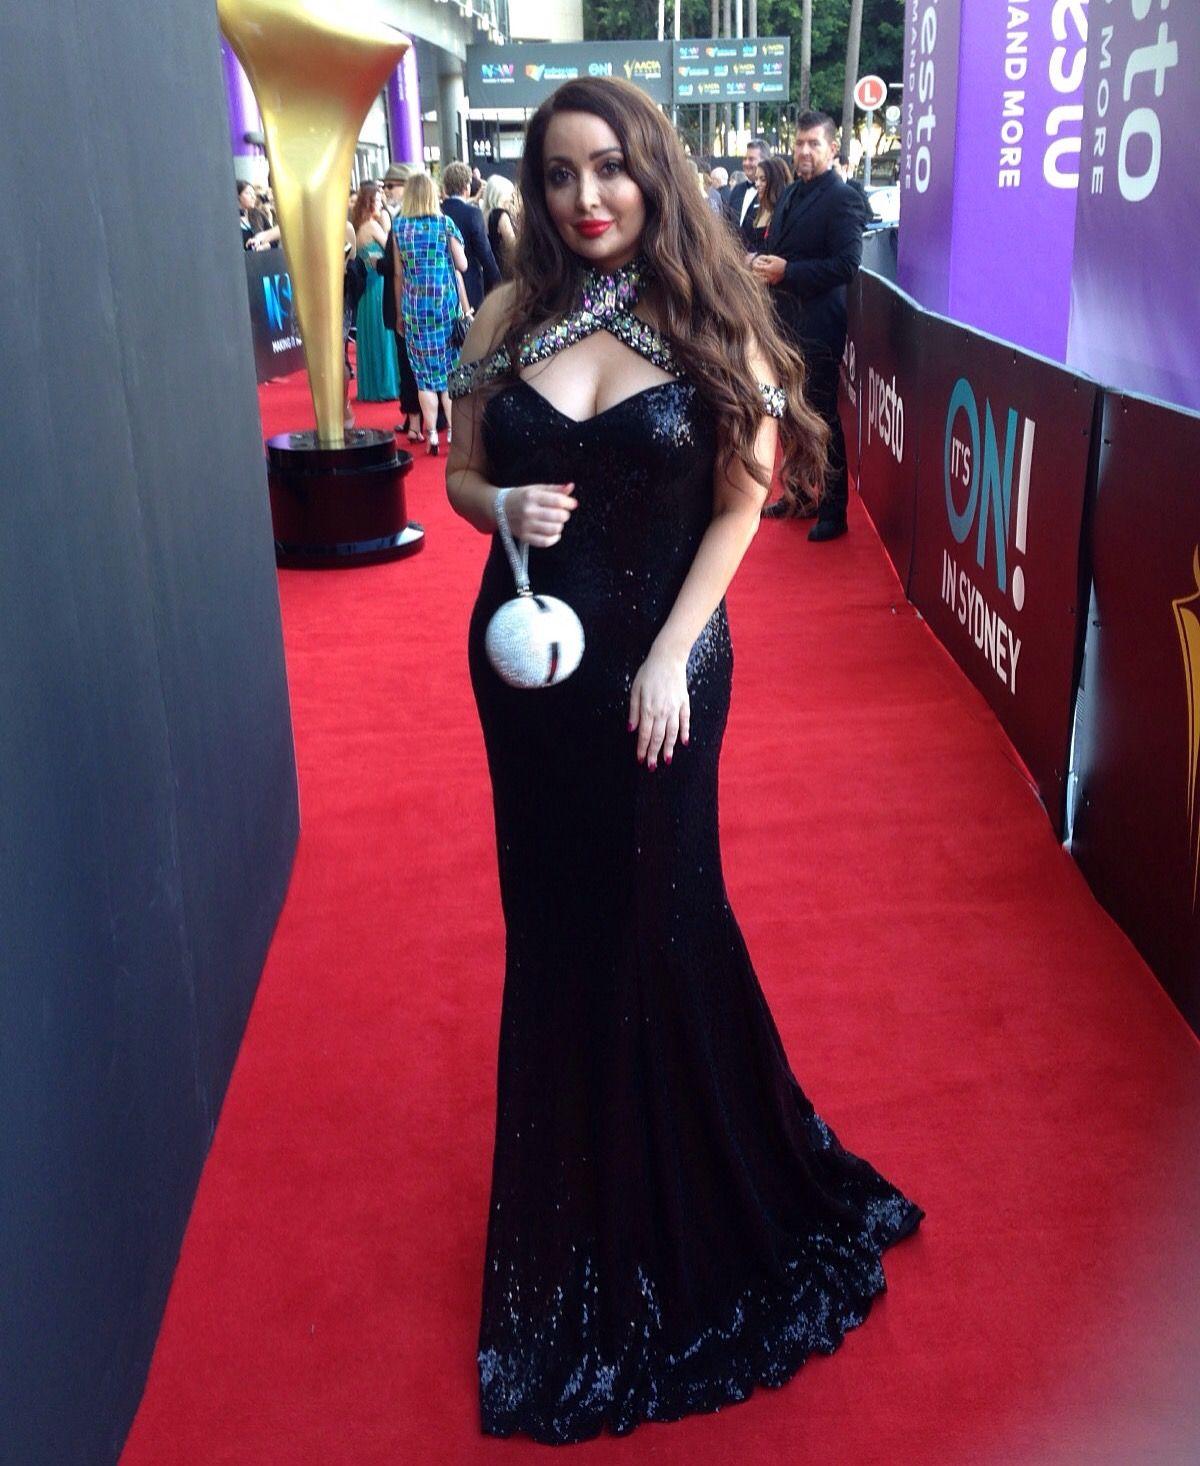 Marisa Lamonica was wearing Villoni Dress at AACTA awards in Sydney ...